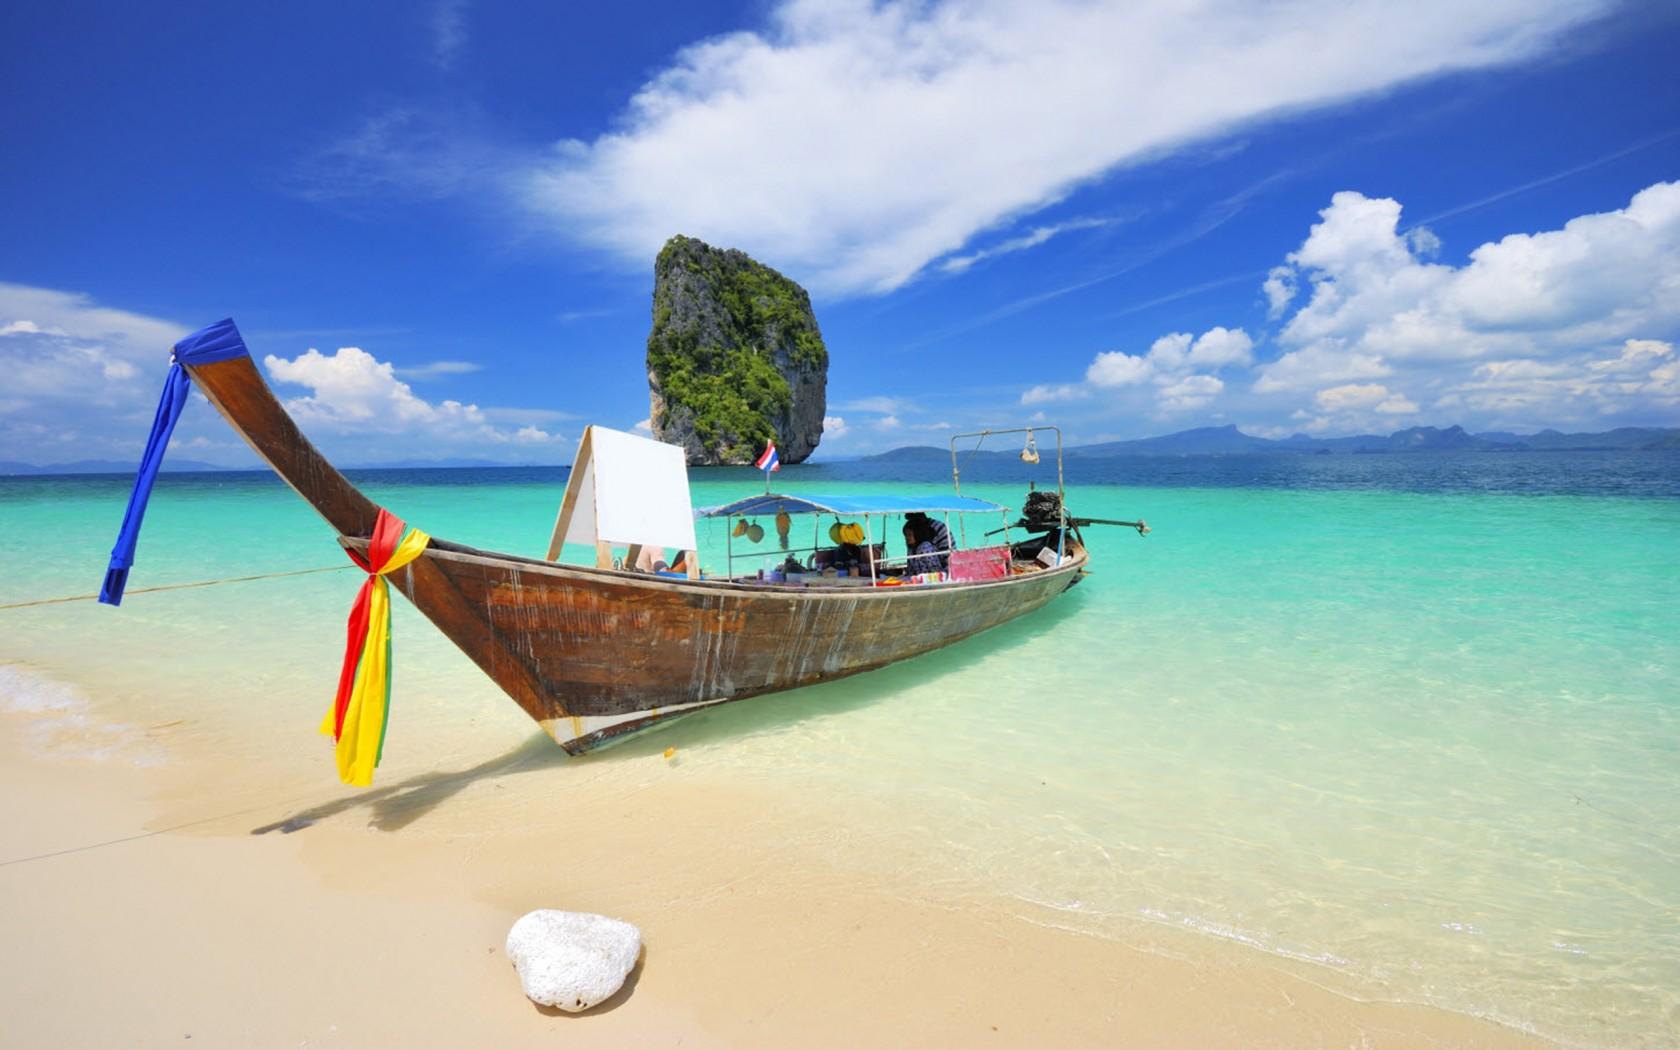 Thailand Beach Wallpapers13com 1680x1050